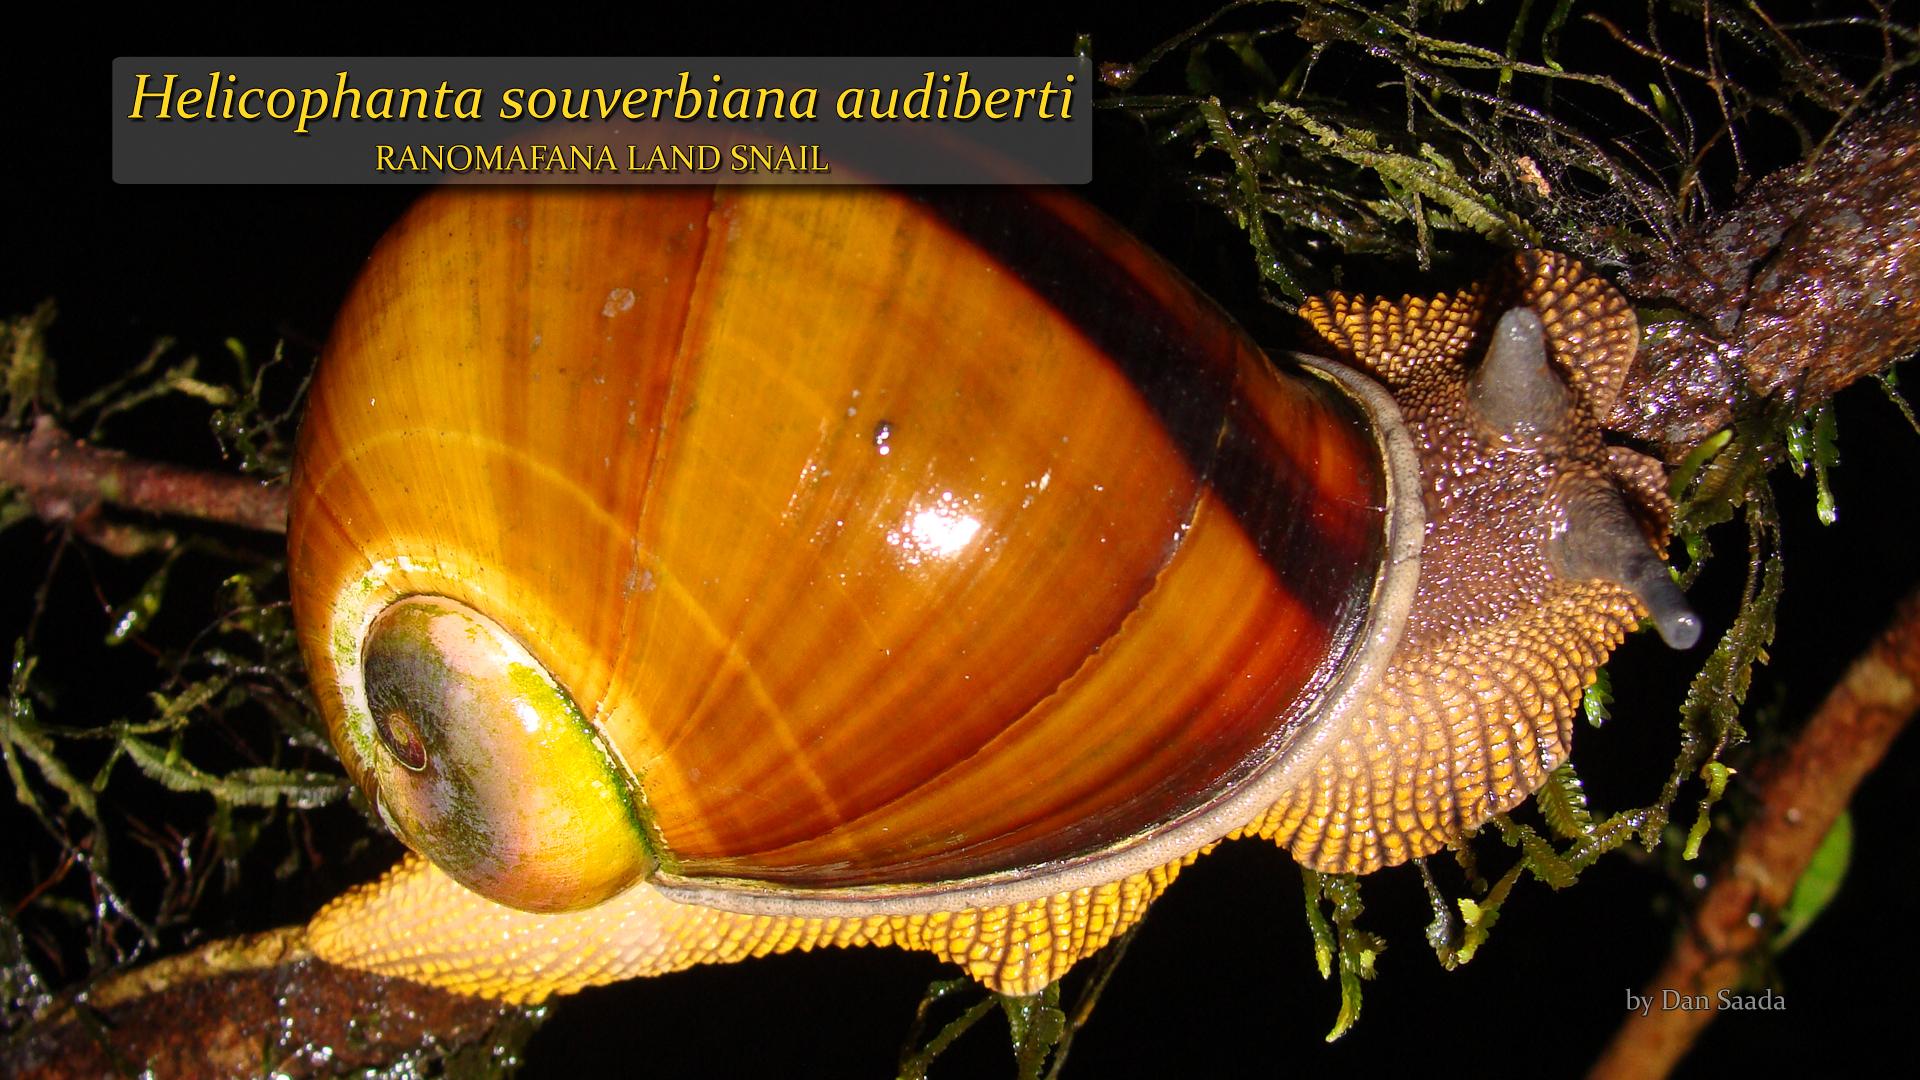 Helicophanta souverbiana audiberti- Dan Saada.jpg